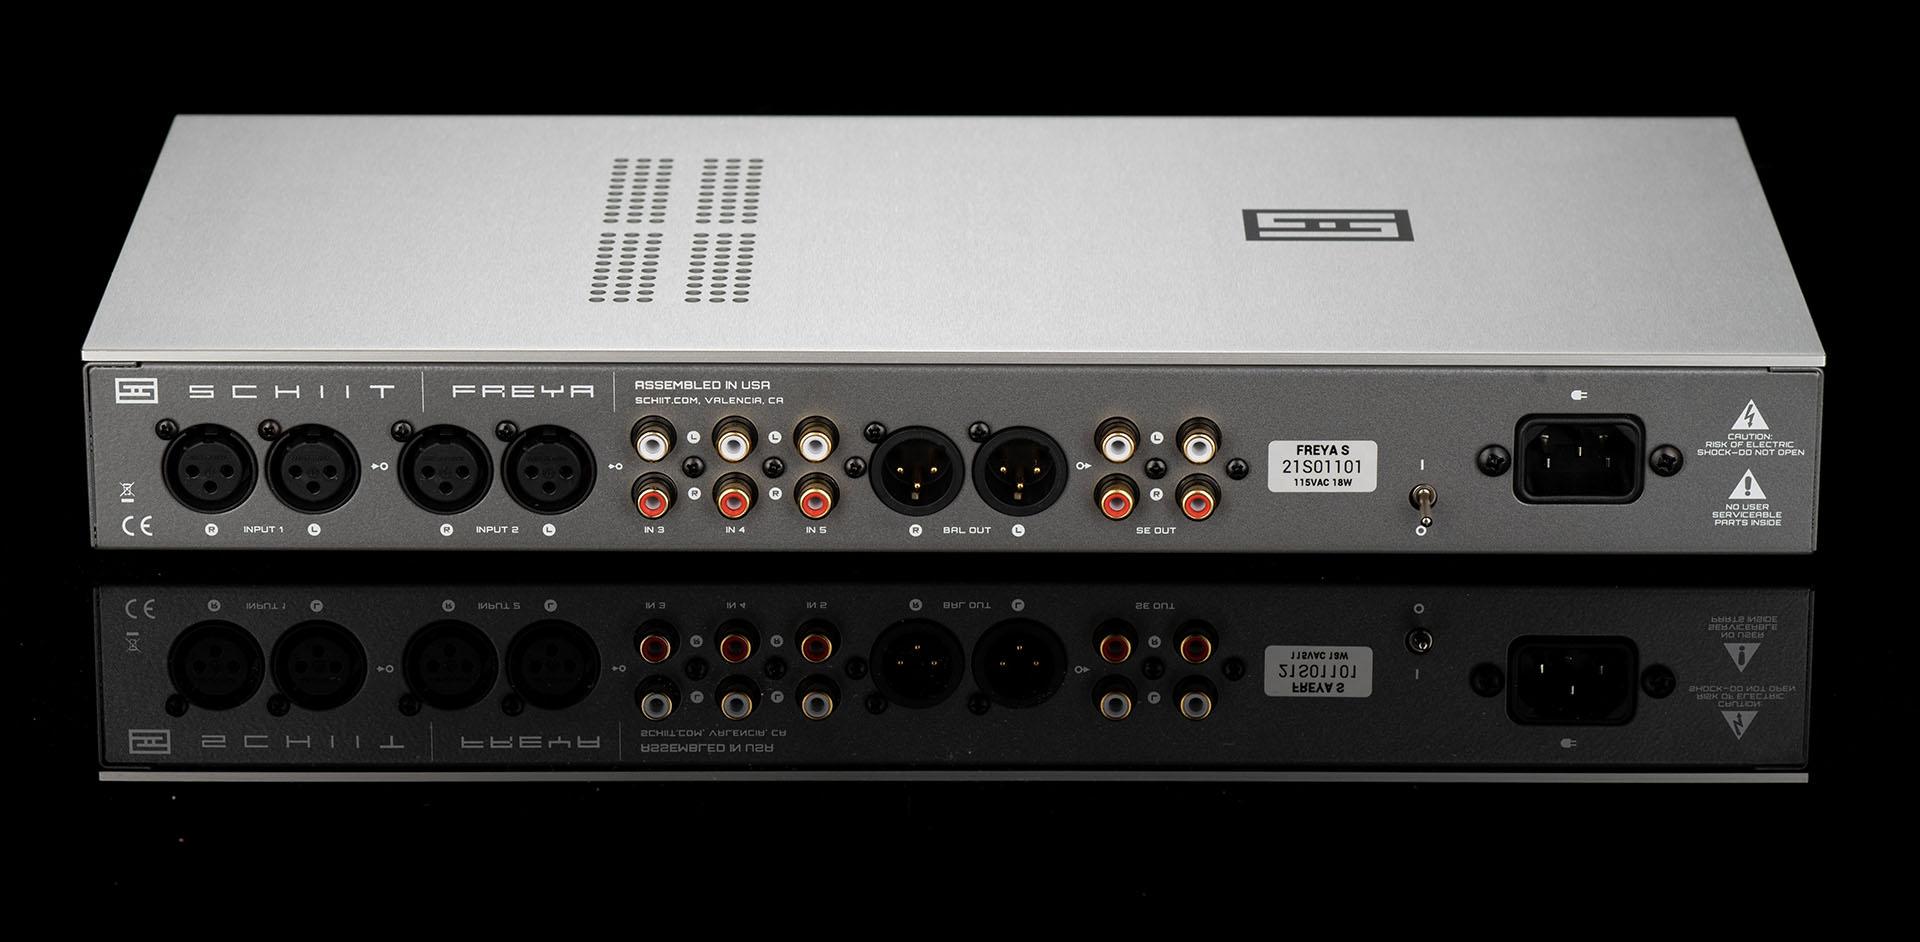 Behringer A800 (2x400W o 1x800W in classe D) - Pagina 12 Freya%20s%20back%201920